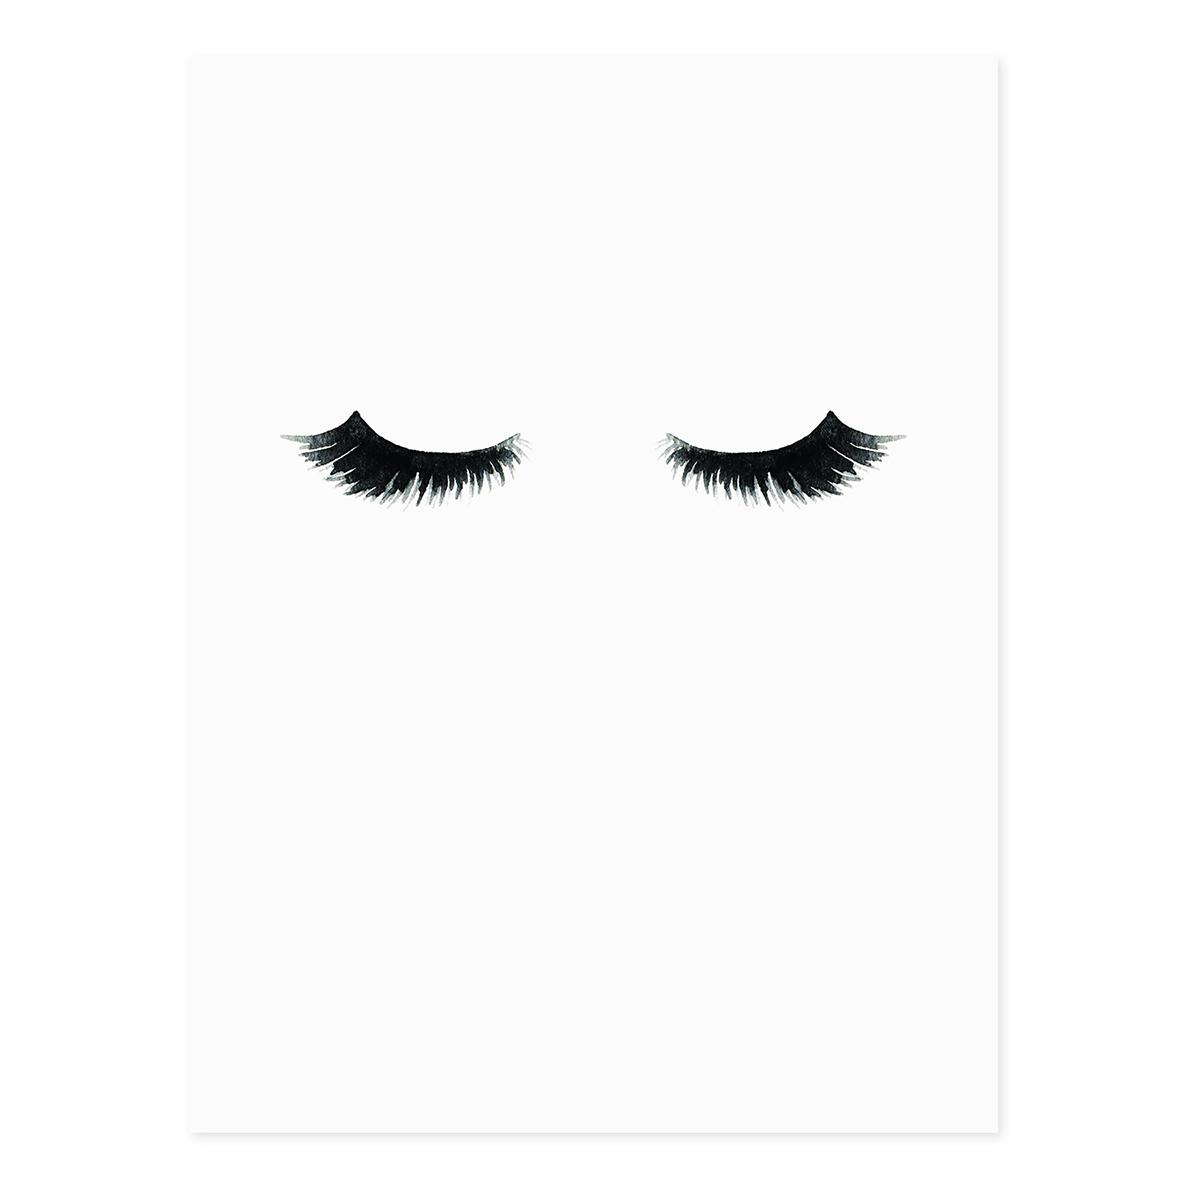 design poster 39 wimpern 39 30x40 cm schwarz weiss aquarell abstrakt poster schwarz weiss. Black Bedroom Furniture Sets. Home Design Ideas